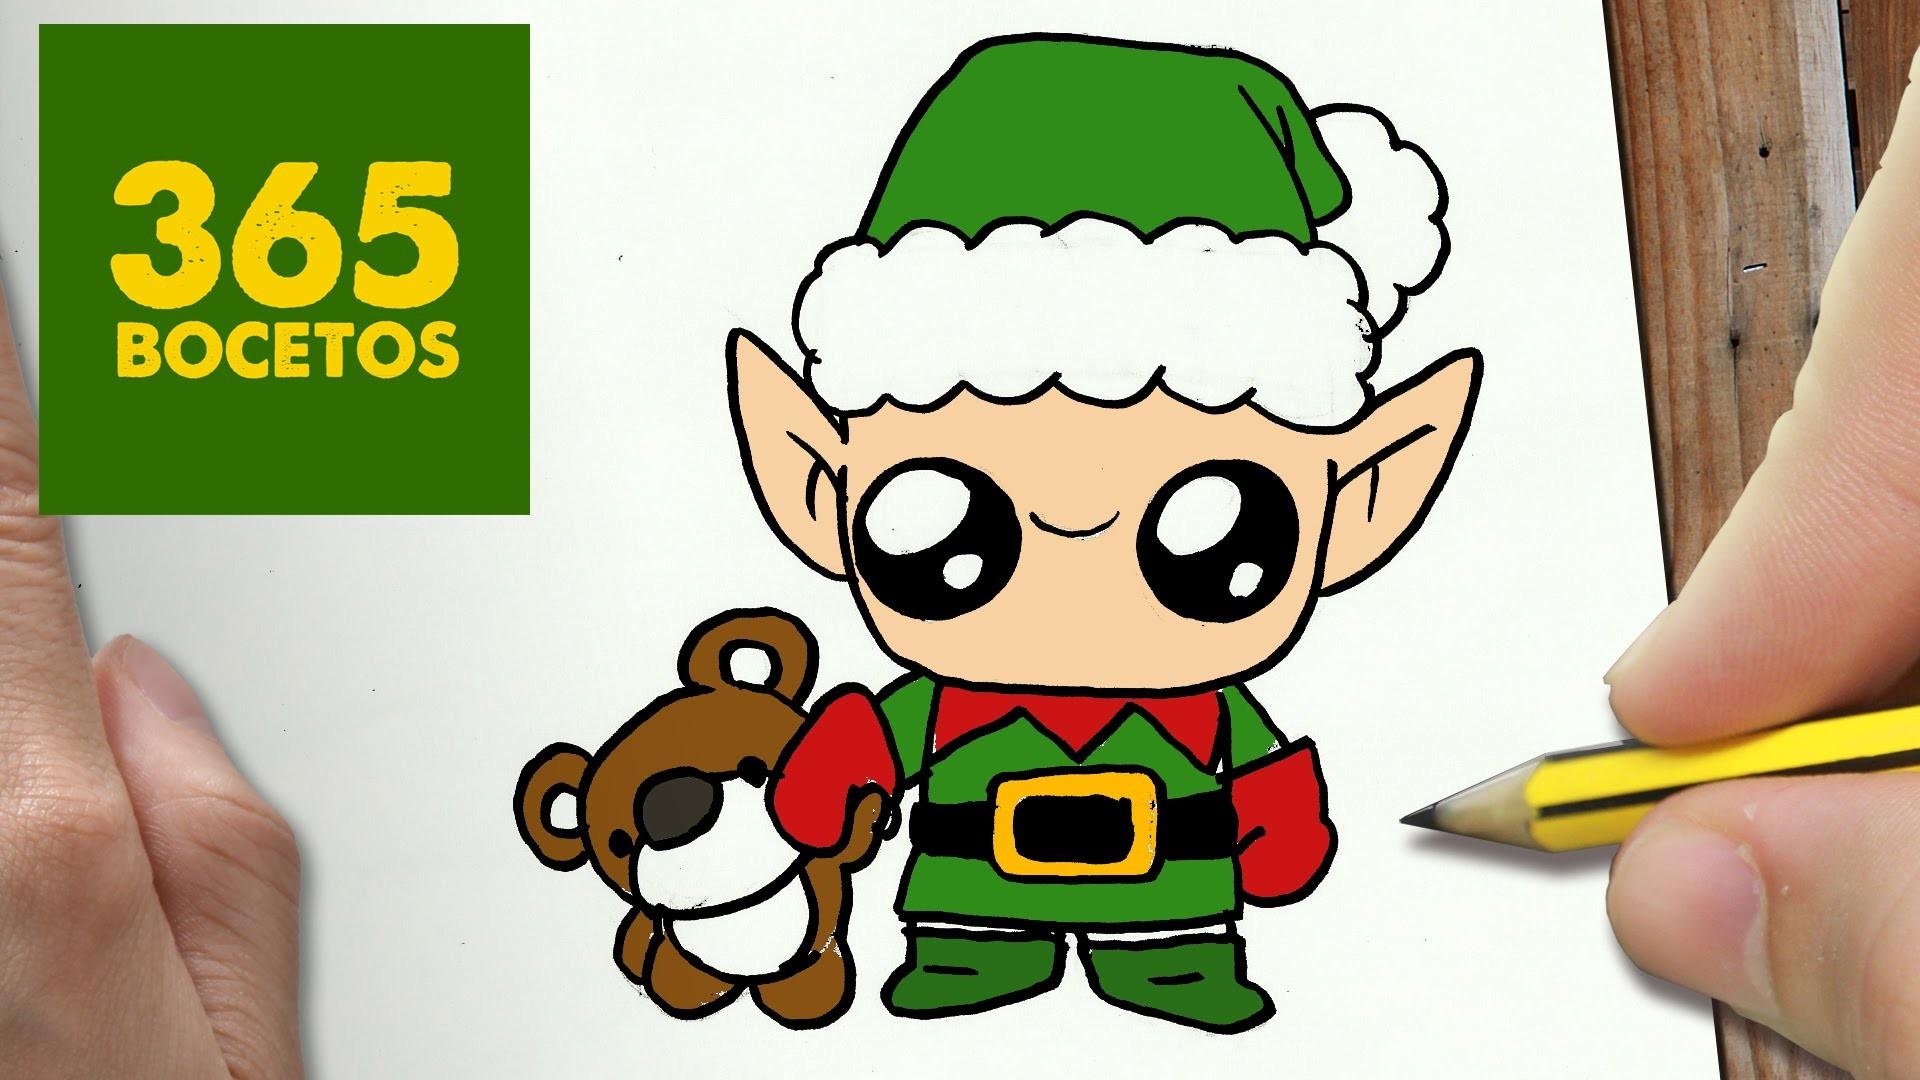 COMO DIBUJAR UN ELFO PARA NAVIDAD PASO A PASO: Dibujos kawaii navideños - How to draw a Elfa